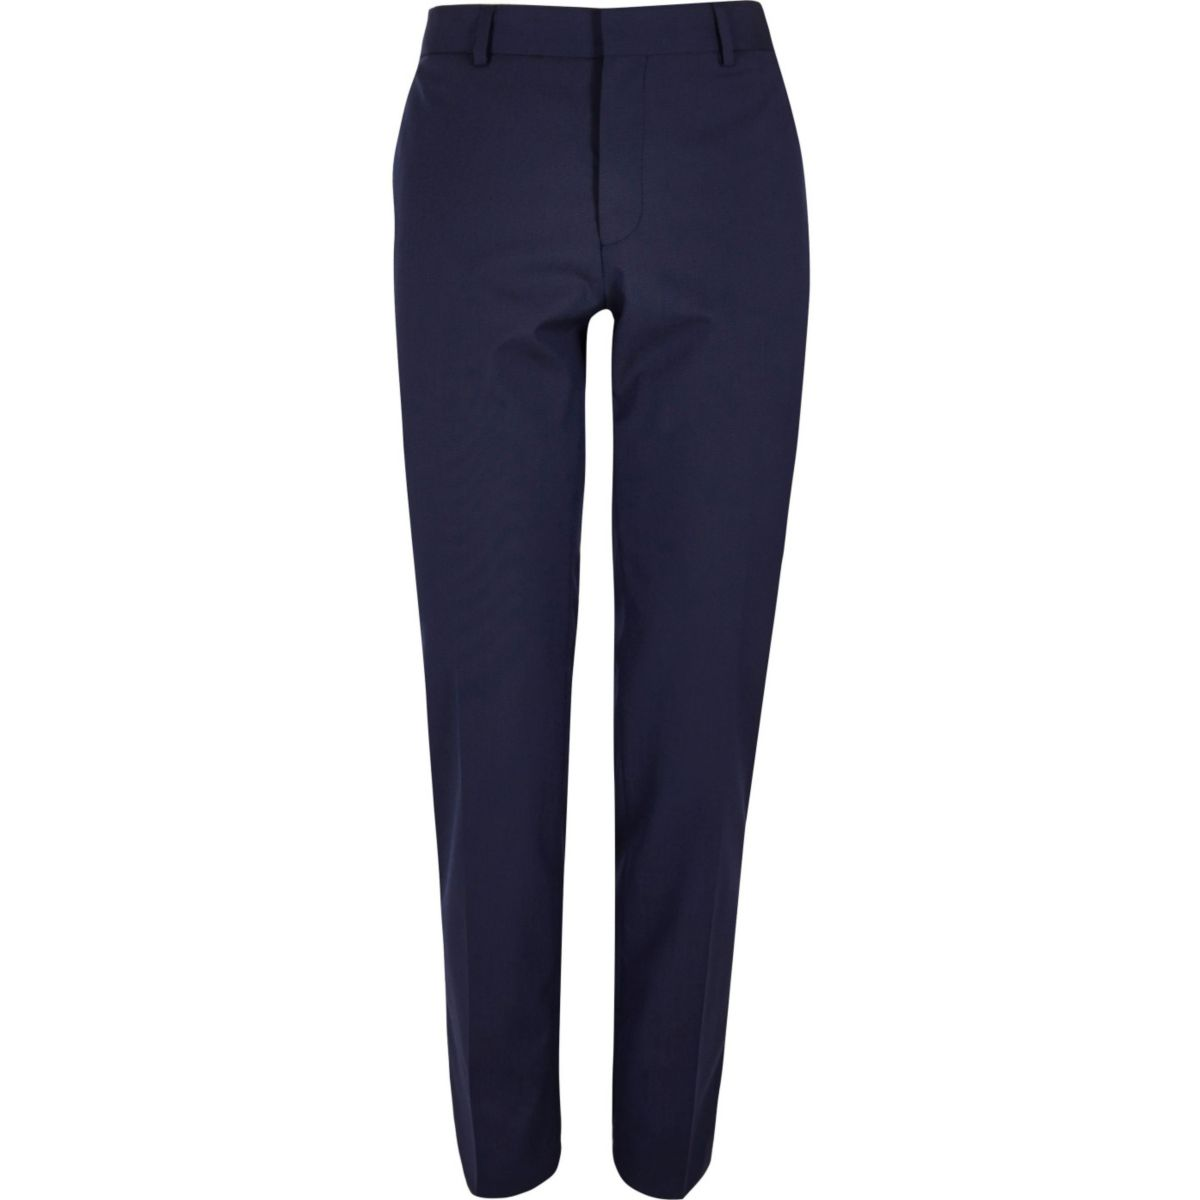 Dark blue skinny fit suit trousers